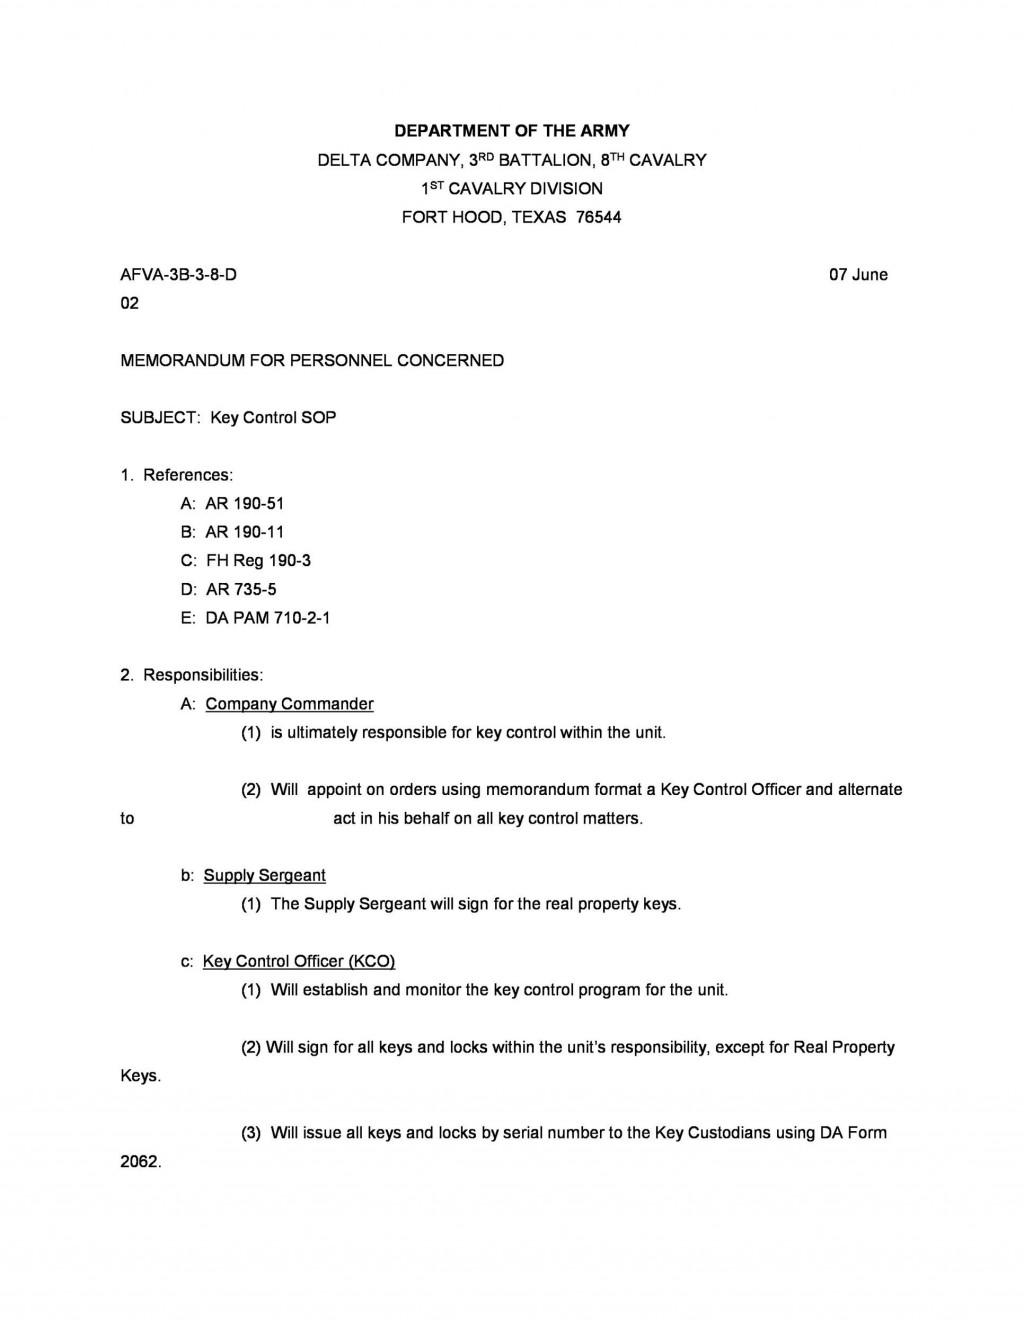 008 Stirring Private Placement Memorandum Outline High Definition  Template Offering Sample FilmLarge